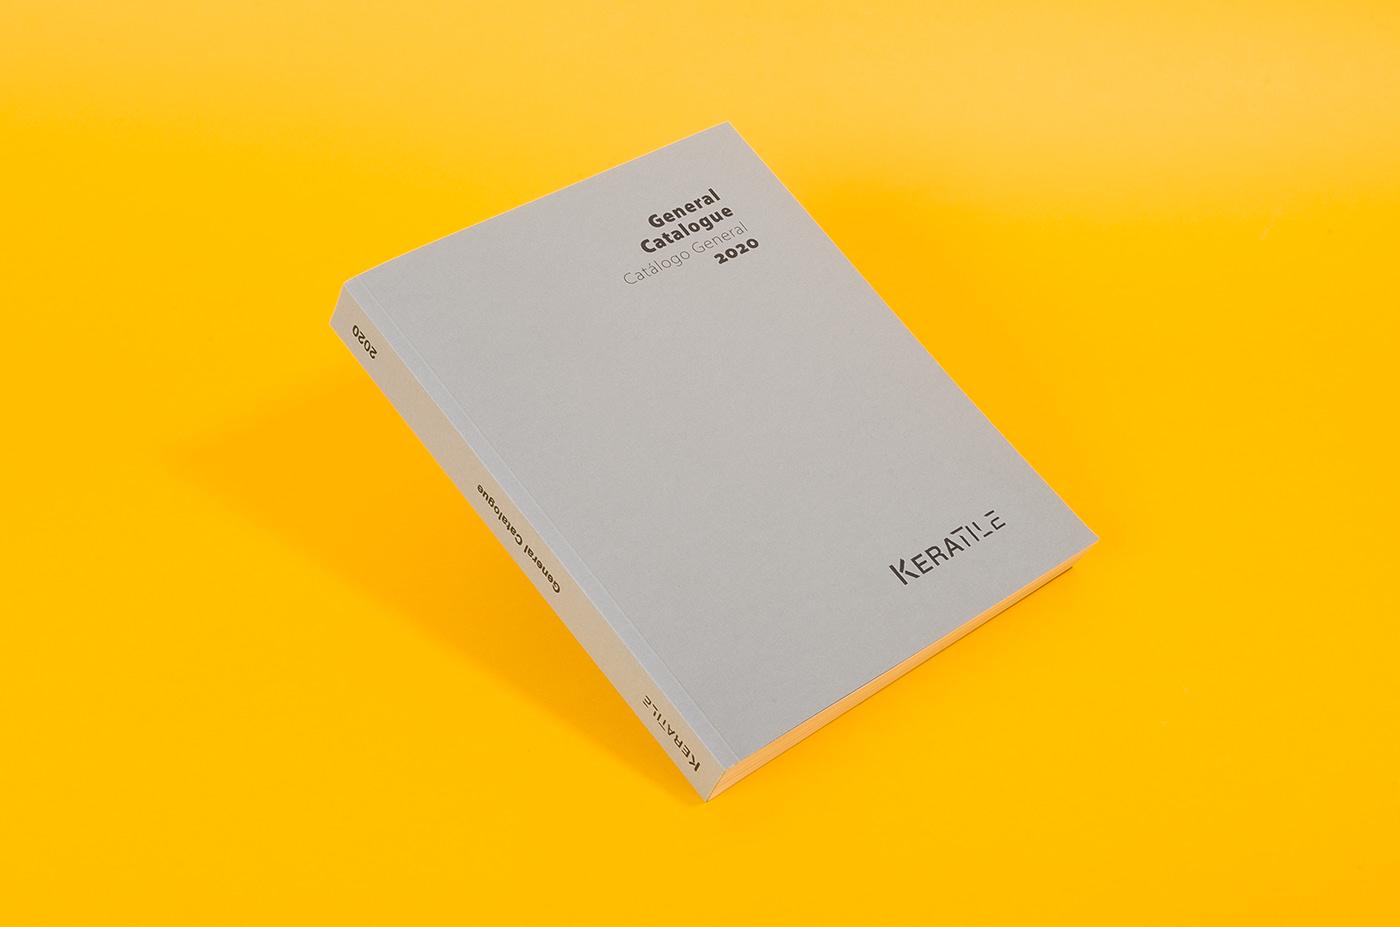 Catálogo general - KERATILE - 2020